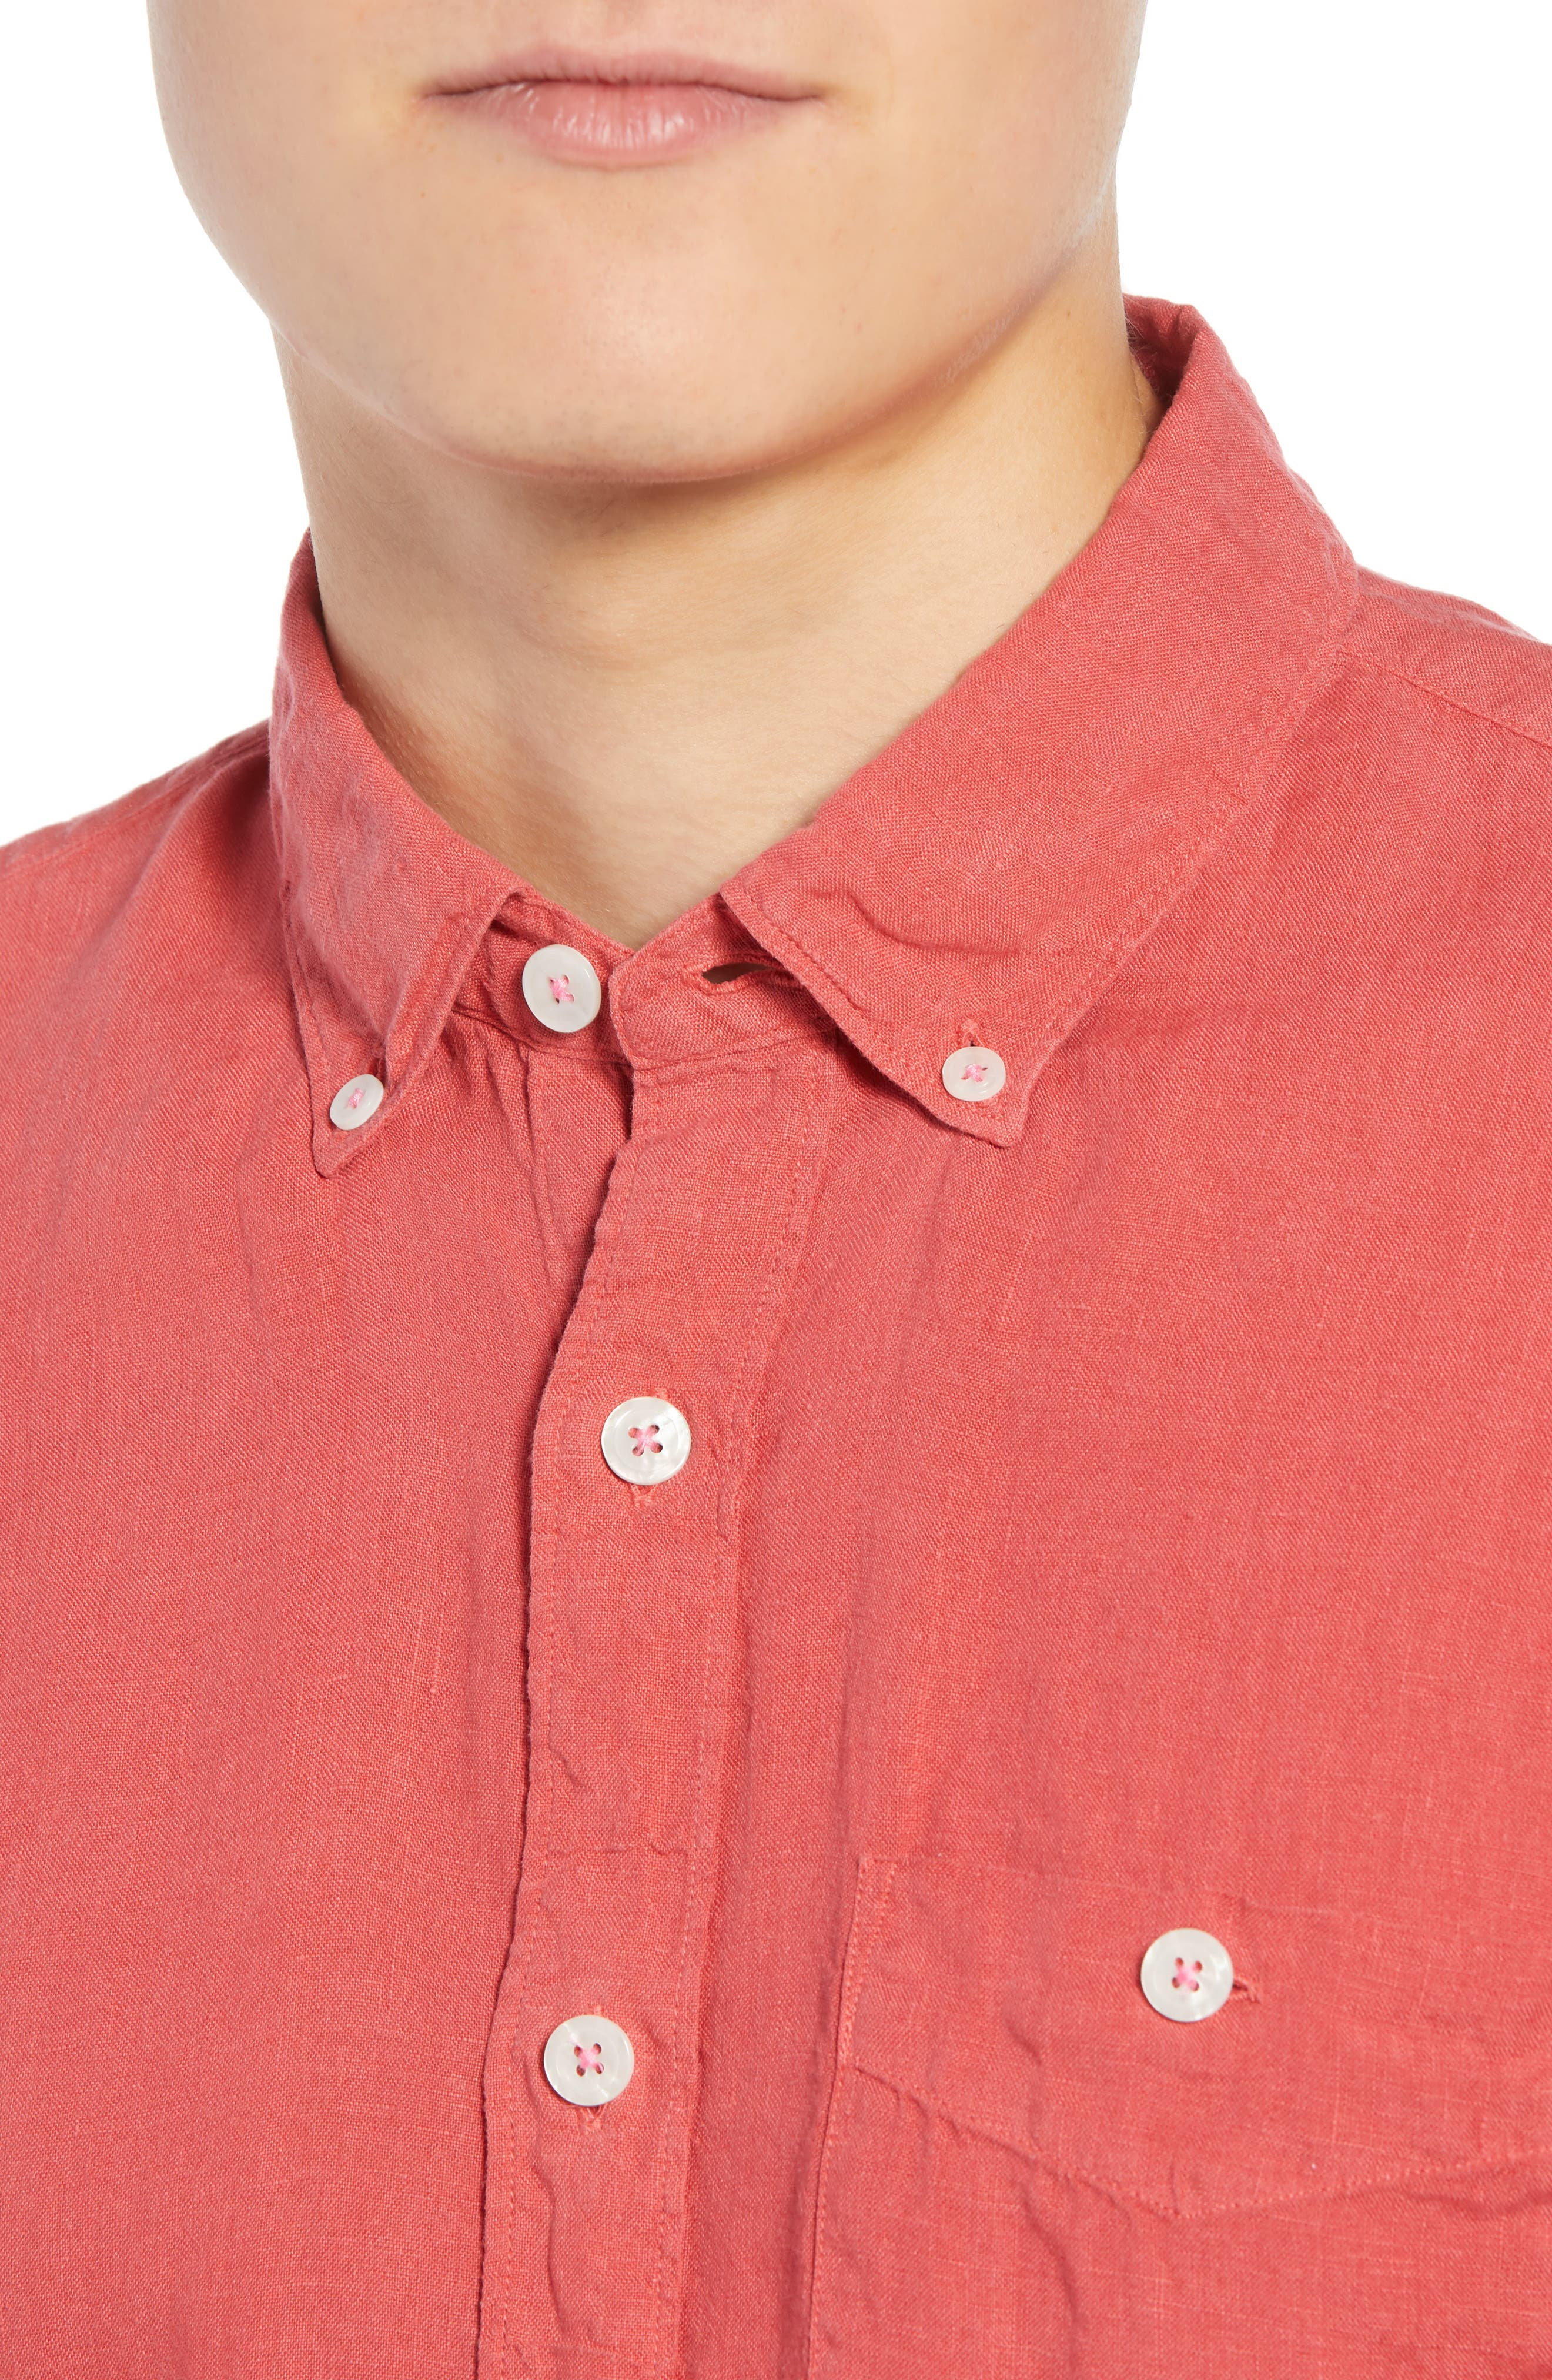 Regular Fit Linen Sport Shirt,                             Alternate thumbnail 2, color,                             Bowery Red